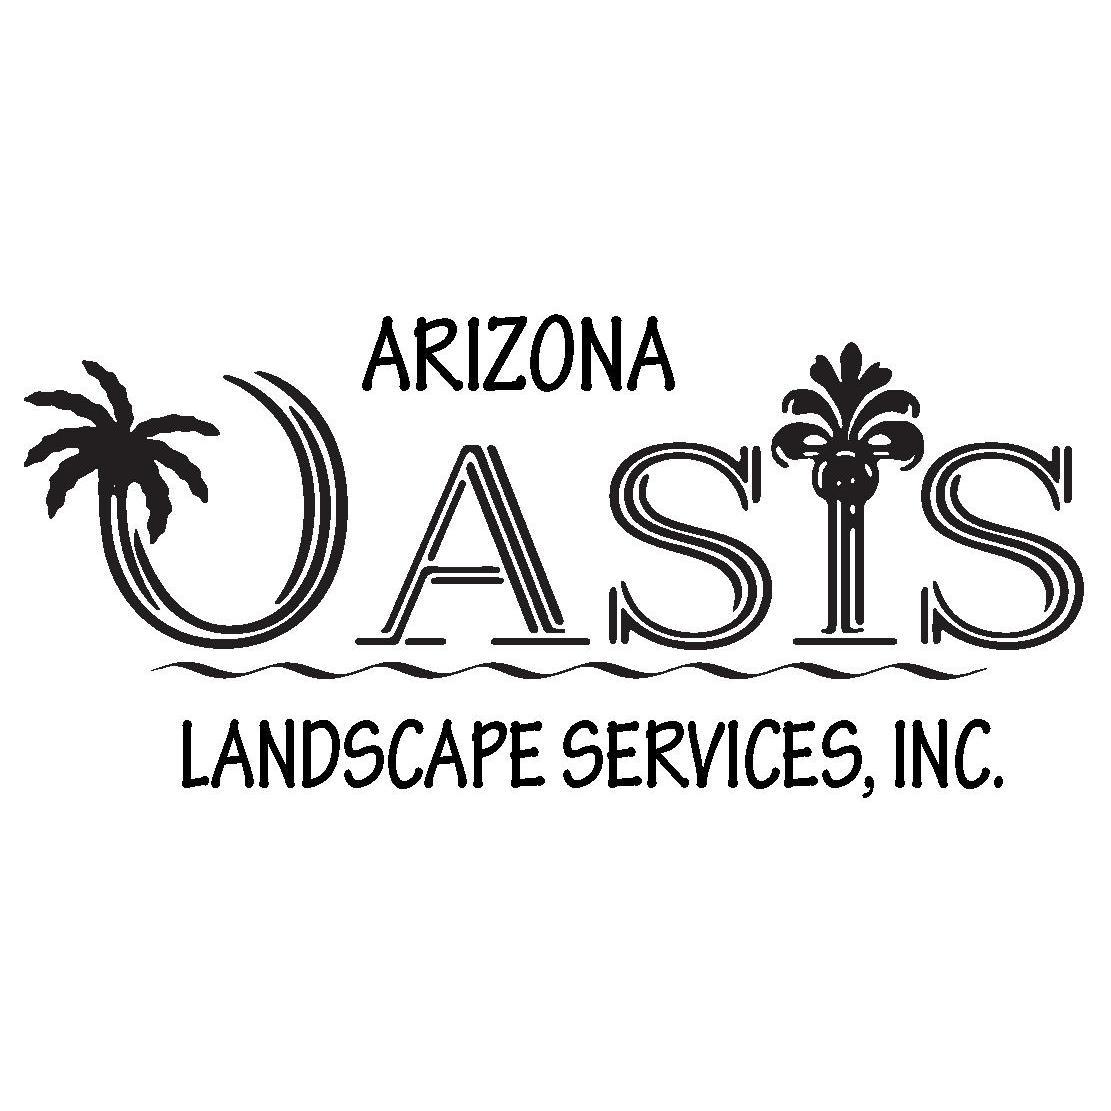 Hotels Nearby - Arizona Oasis Landscape Services, Inc. Glendale, AZ - 85308 Glendale